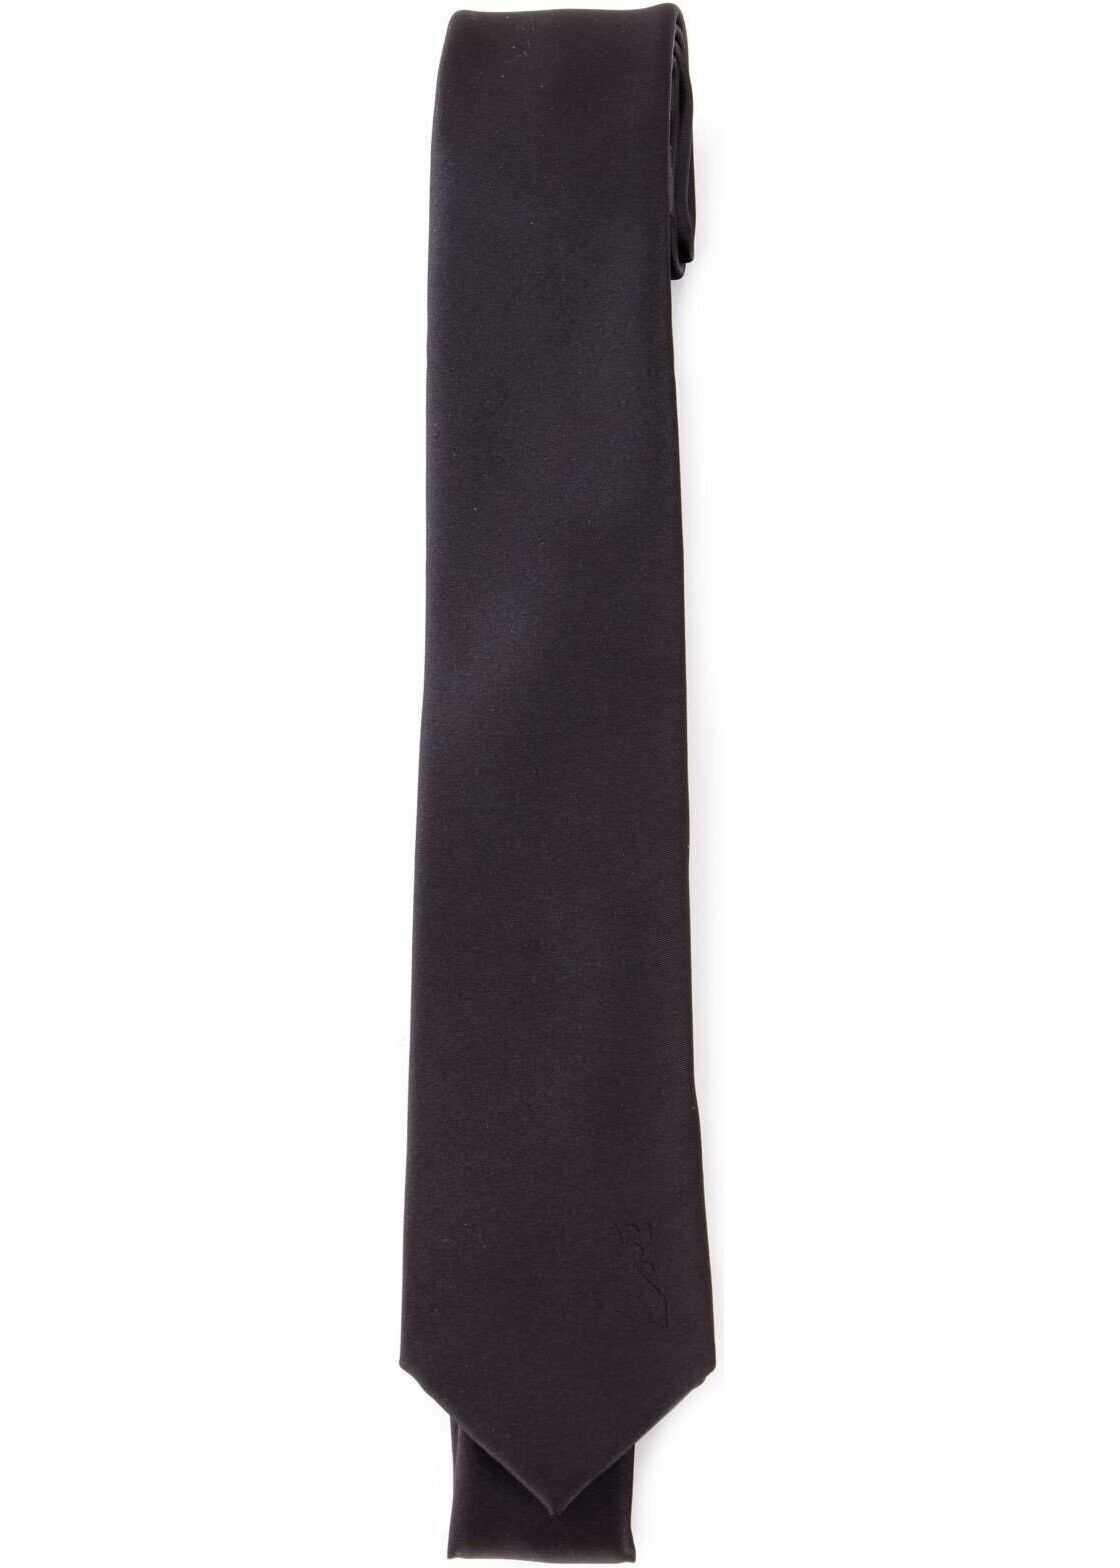 Patrizia Pepe Polyester Tie BLACK